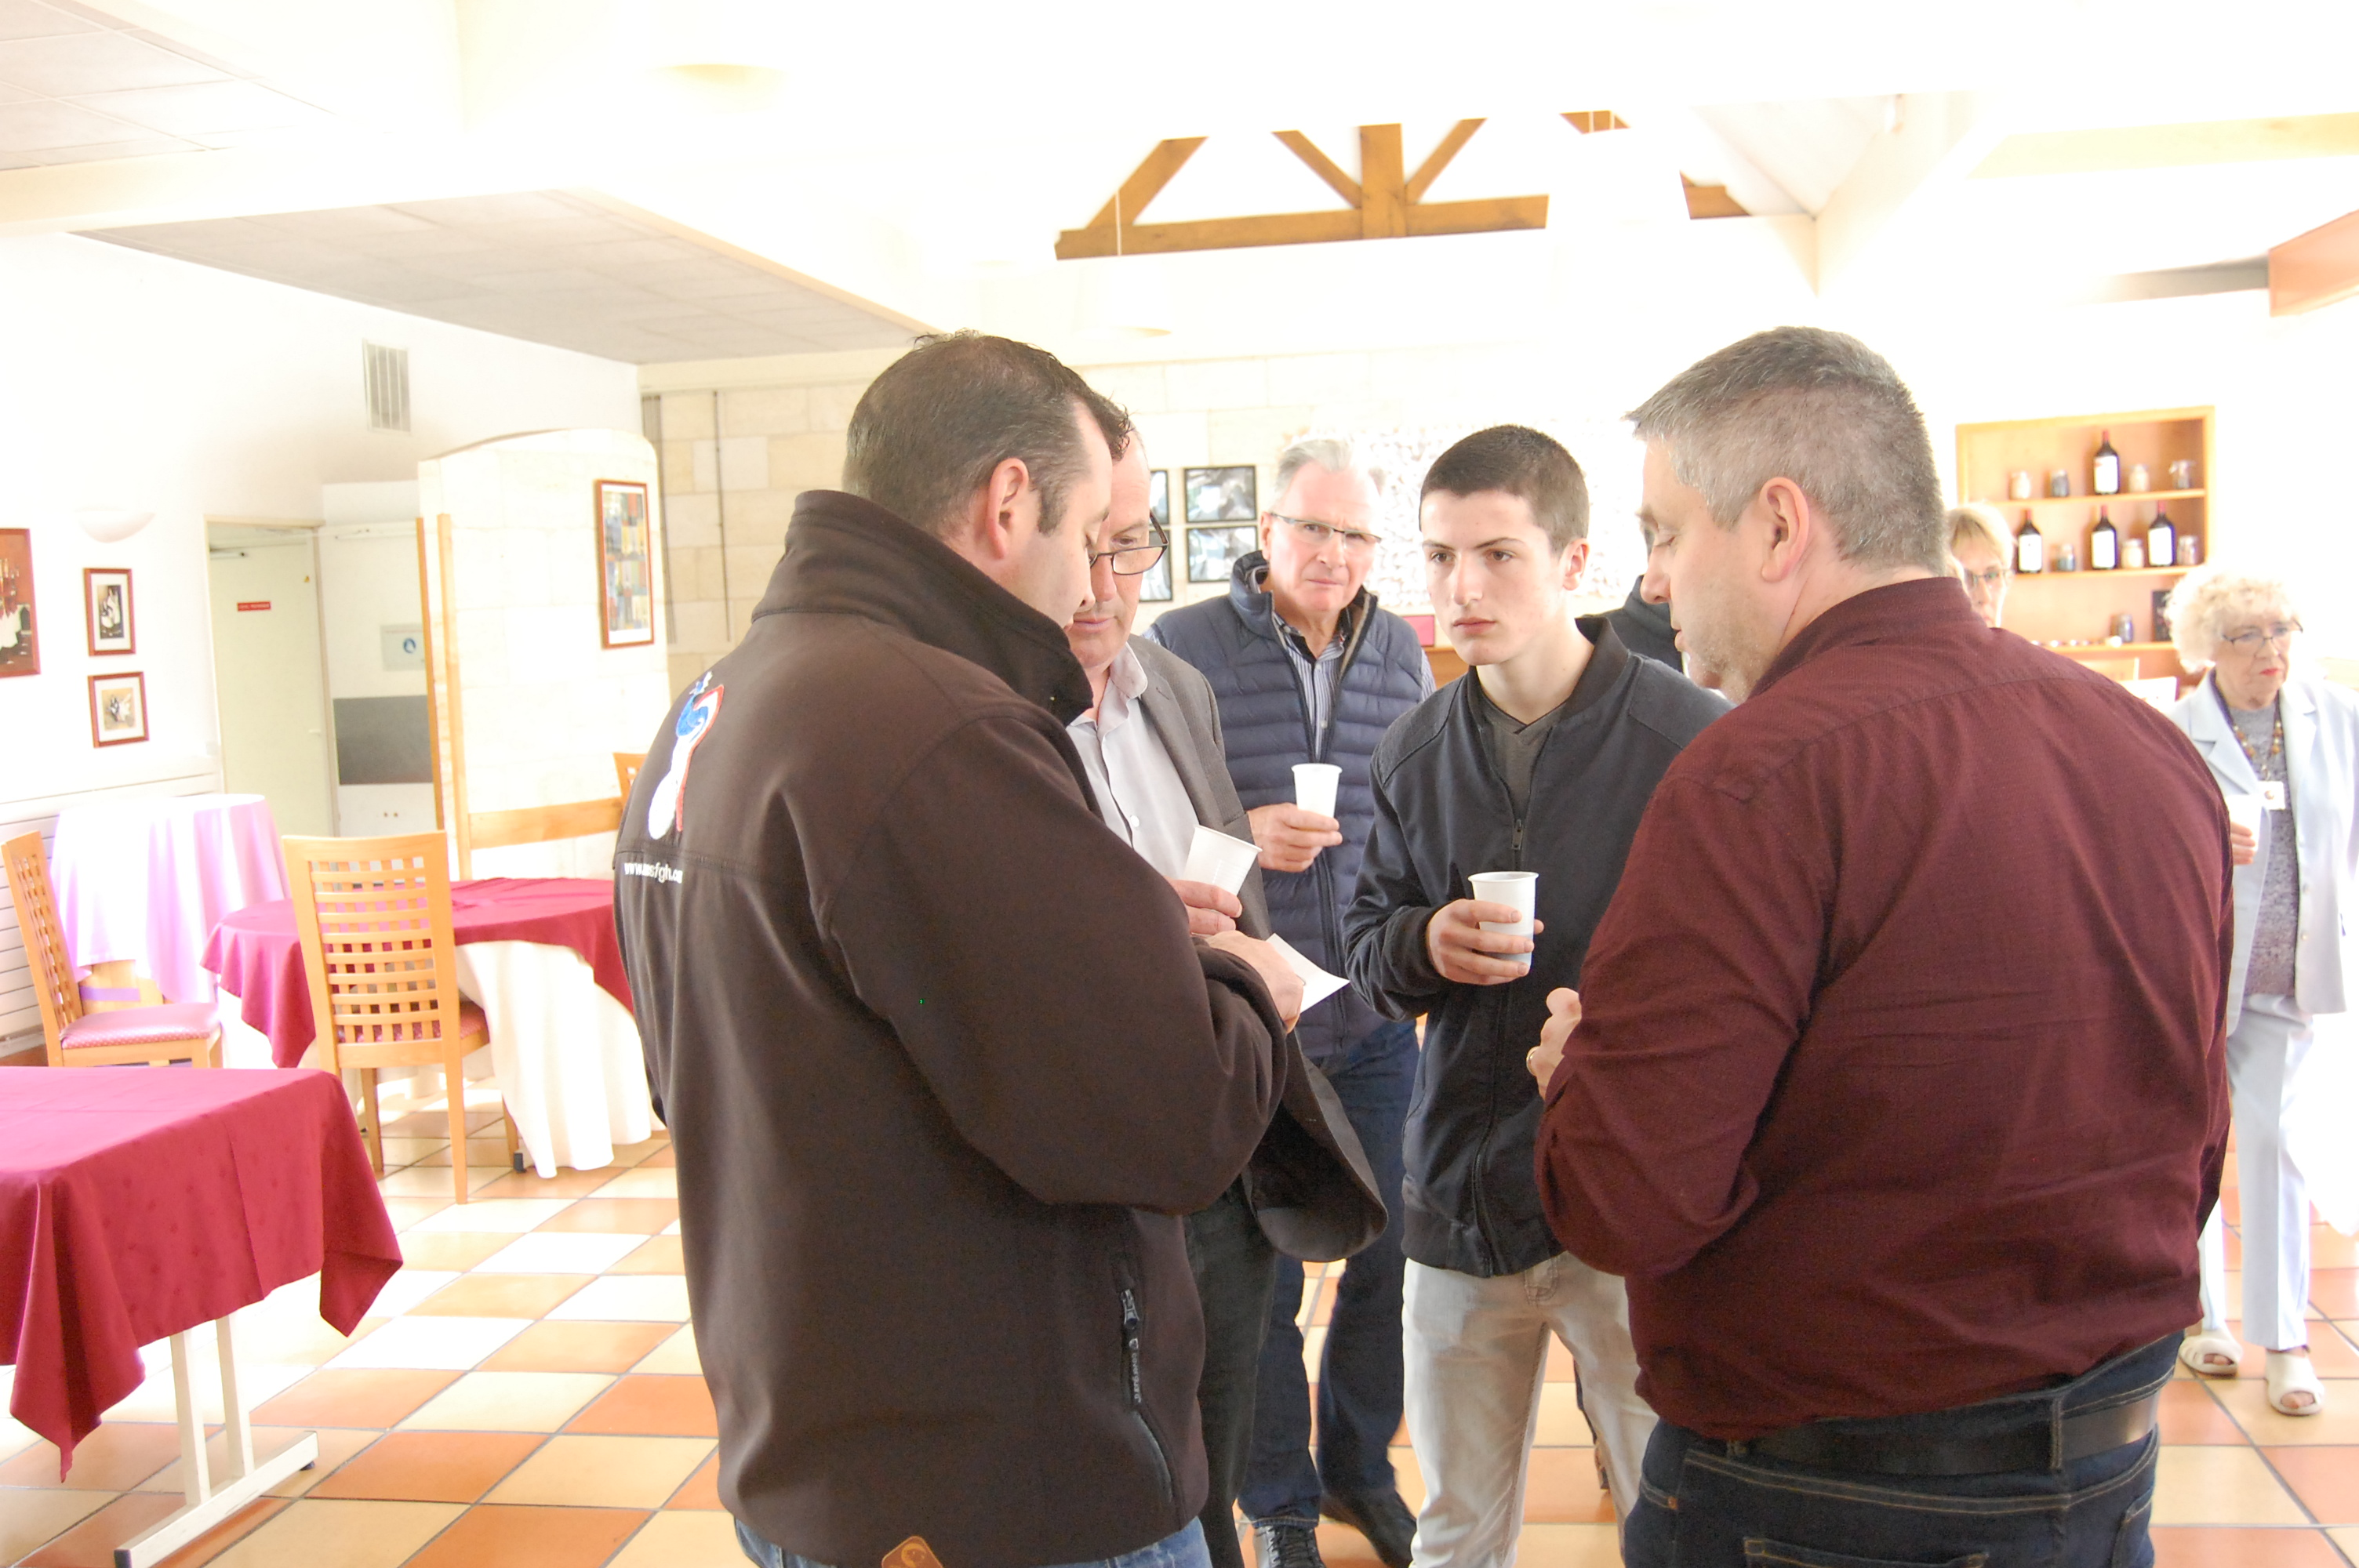 022 AG 2017 Blanquefort Repas samedi midi (6)